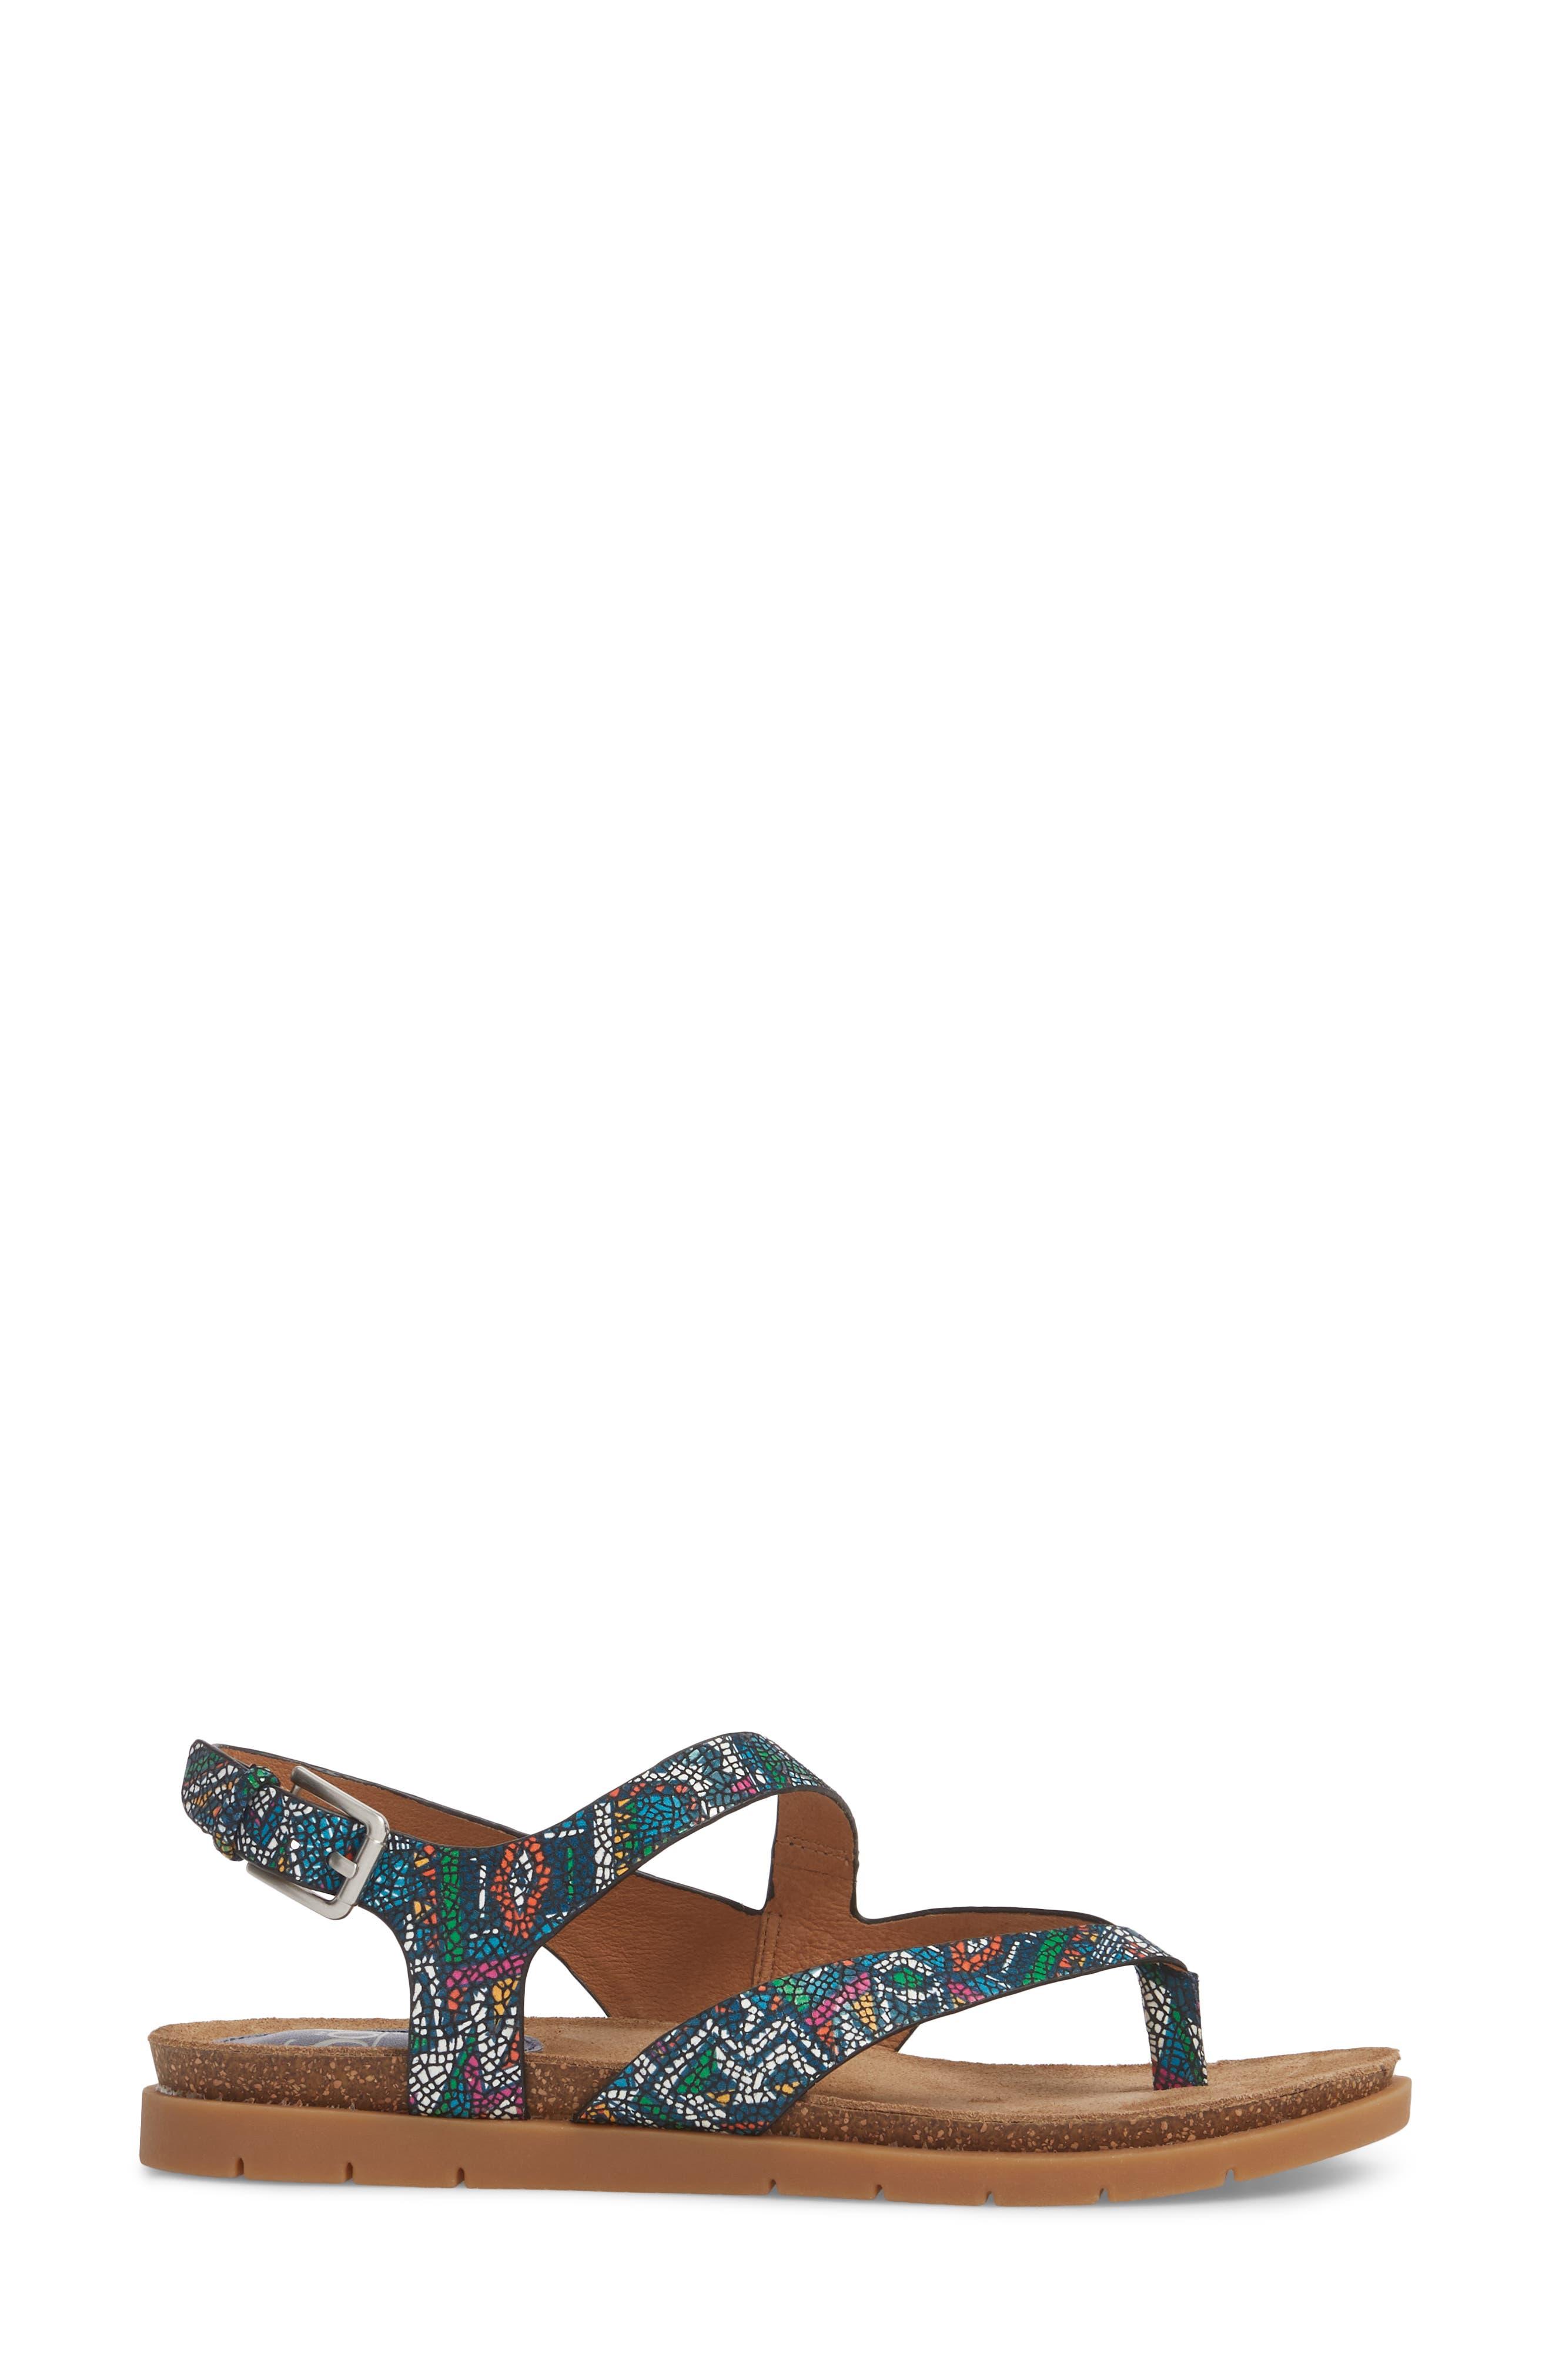 Rory Sandal,                             Alternate thumbnail 3, color,                             Blue Multi Printed Leather